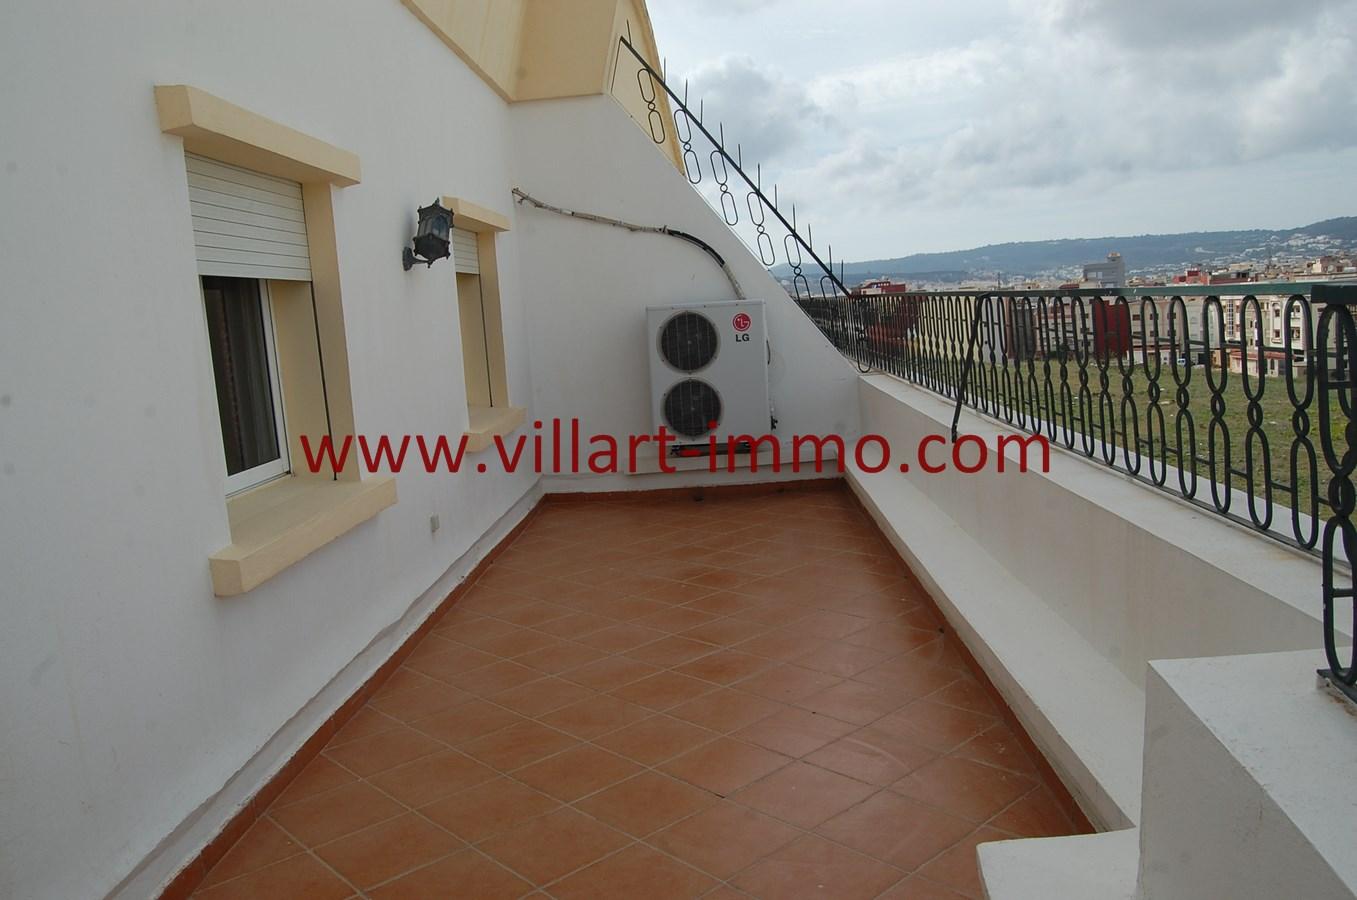 6-Vente-Appartement-Tanger-Route de Rabat-Terrasse 2-VA494-Villart Immo